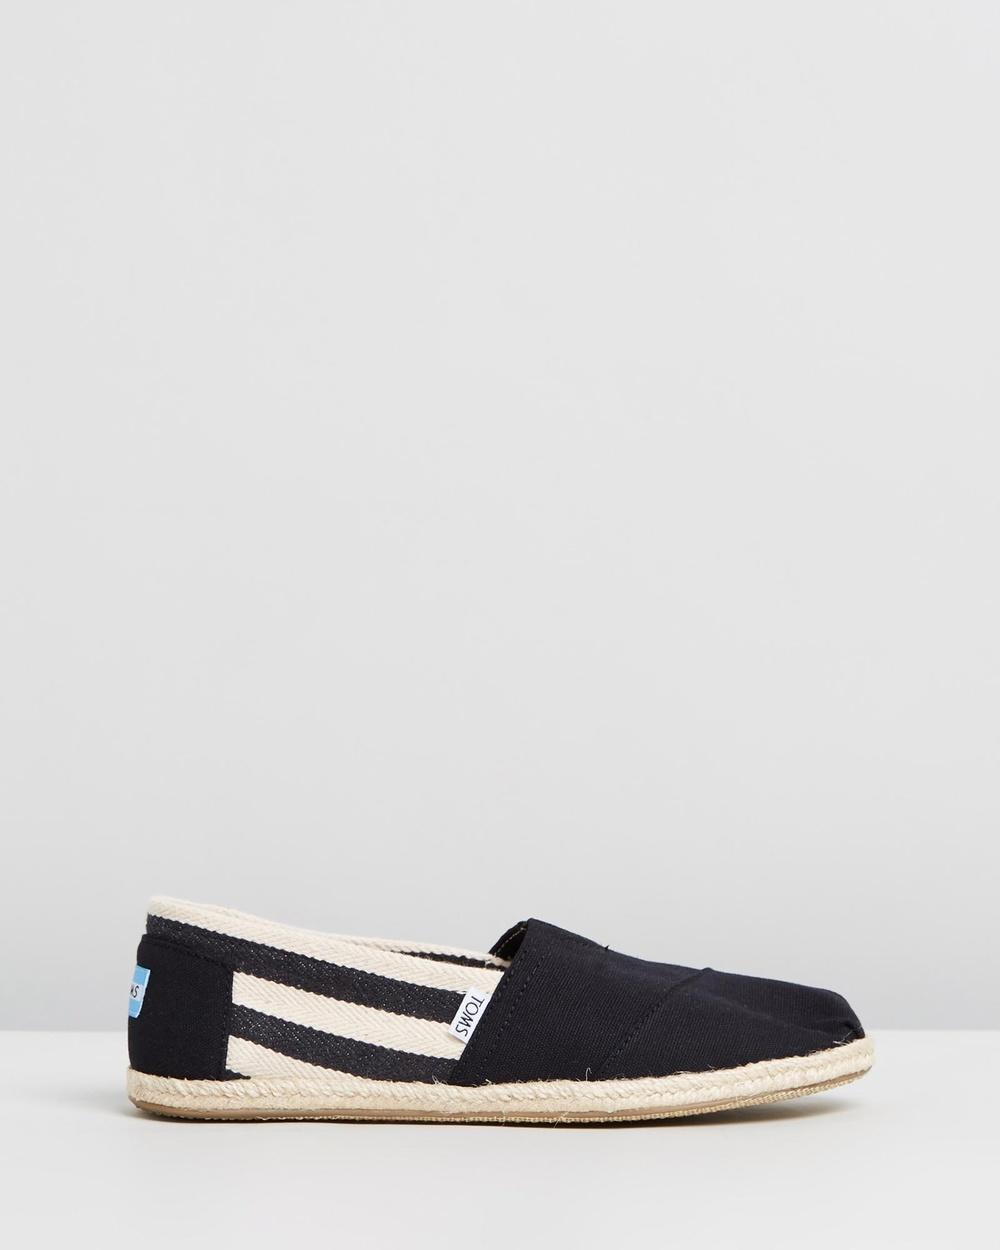 TOMS University Classics Men's Casual Shoes Black Stripe Australia